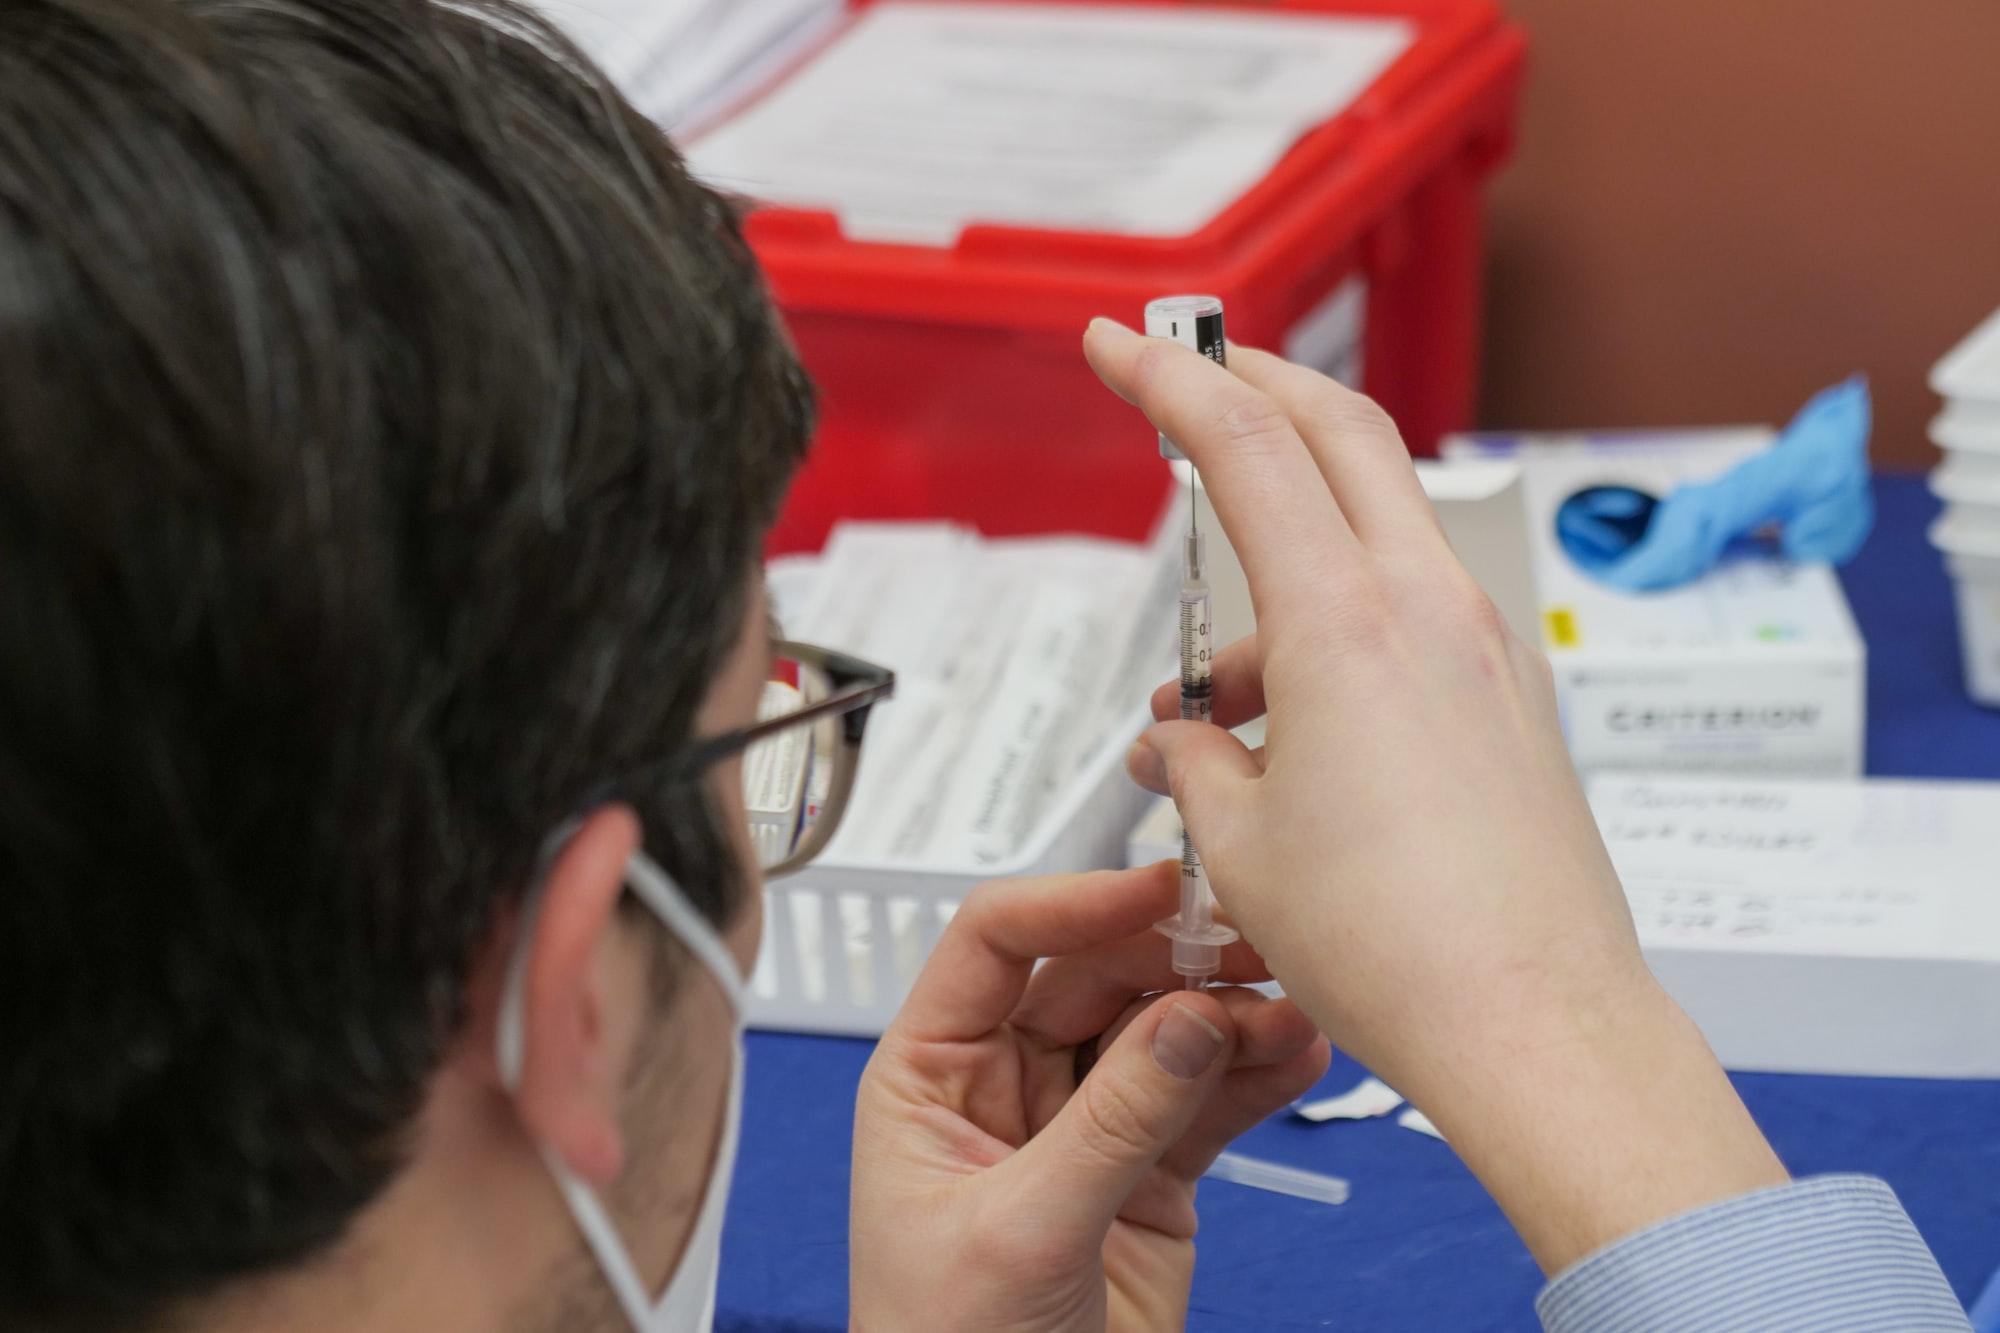 Pharmacist preps Covid-19 vaccine